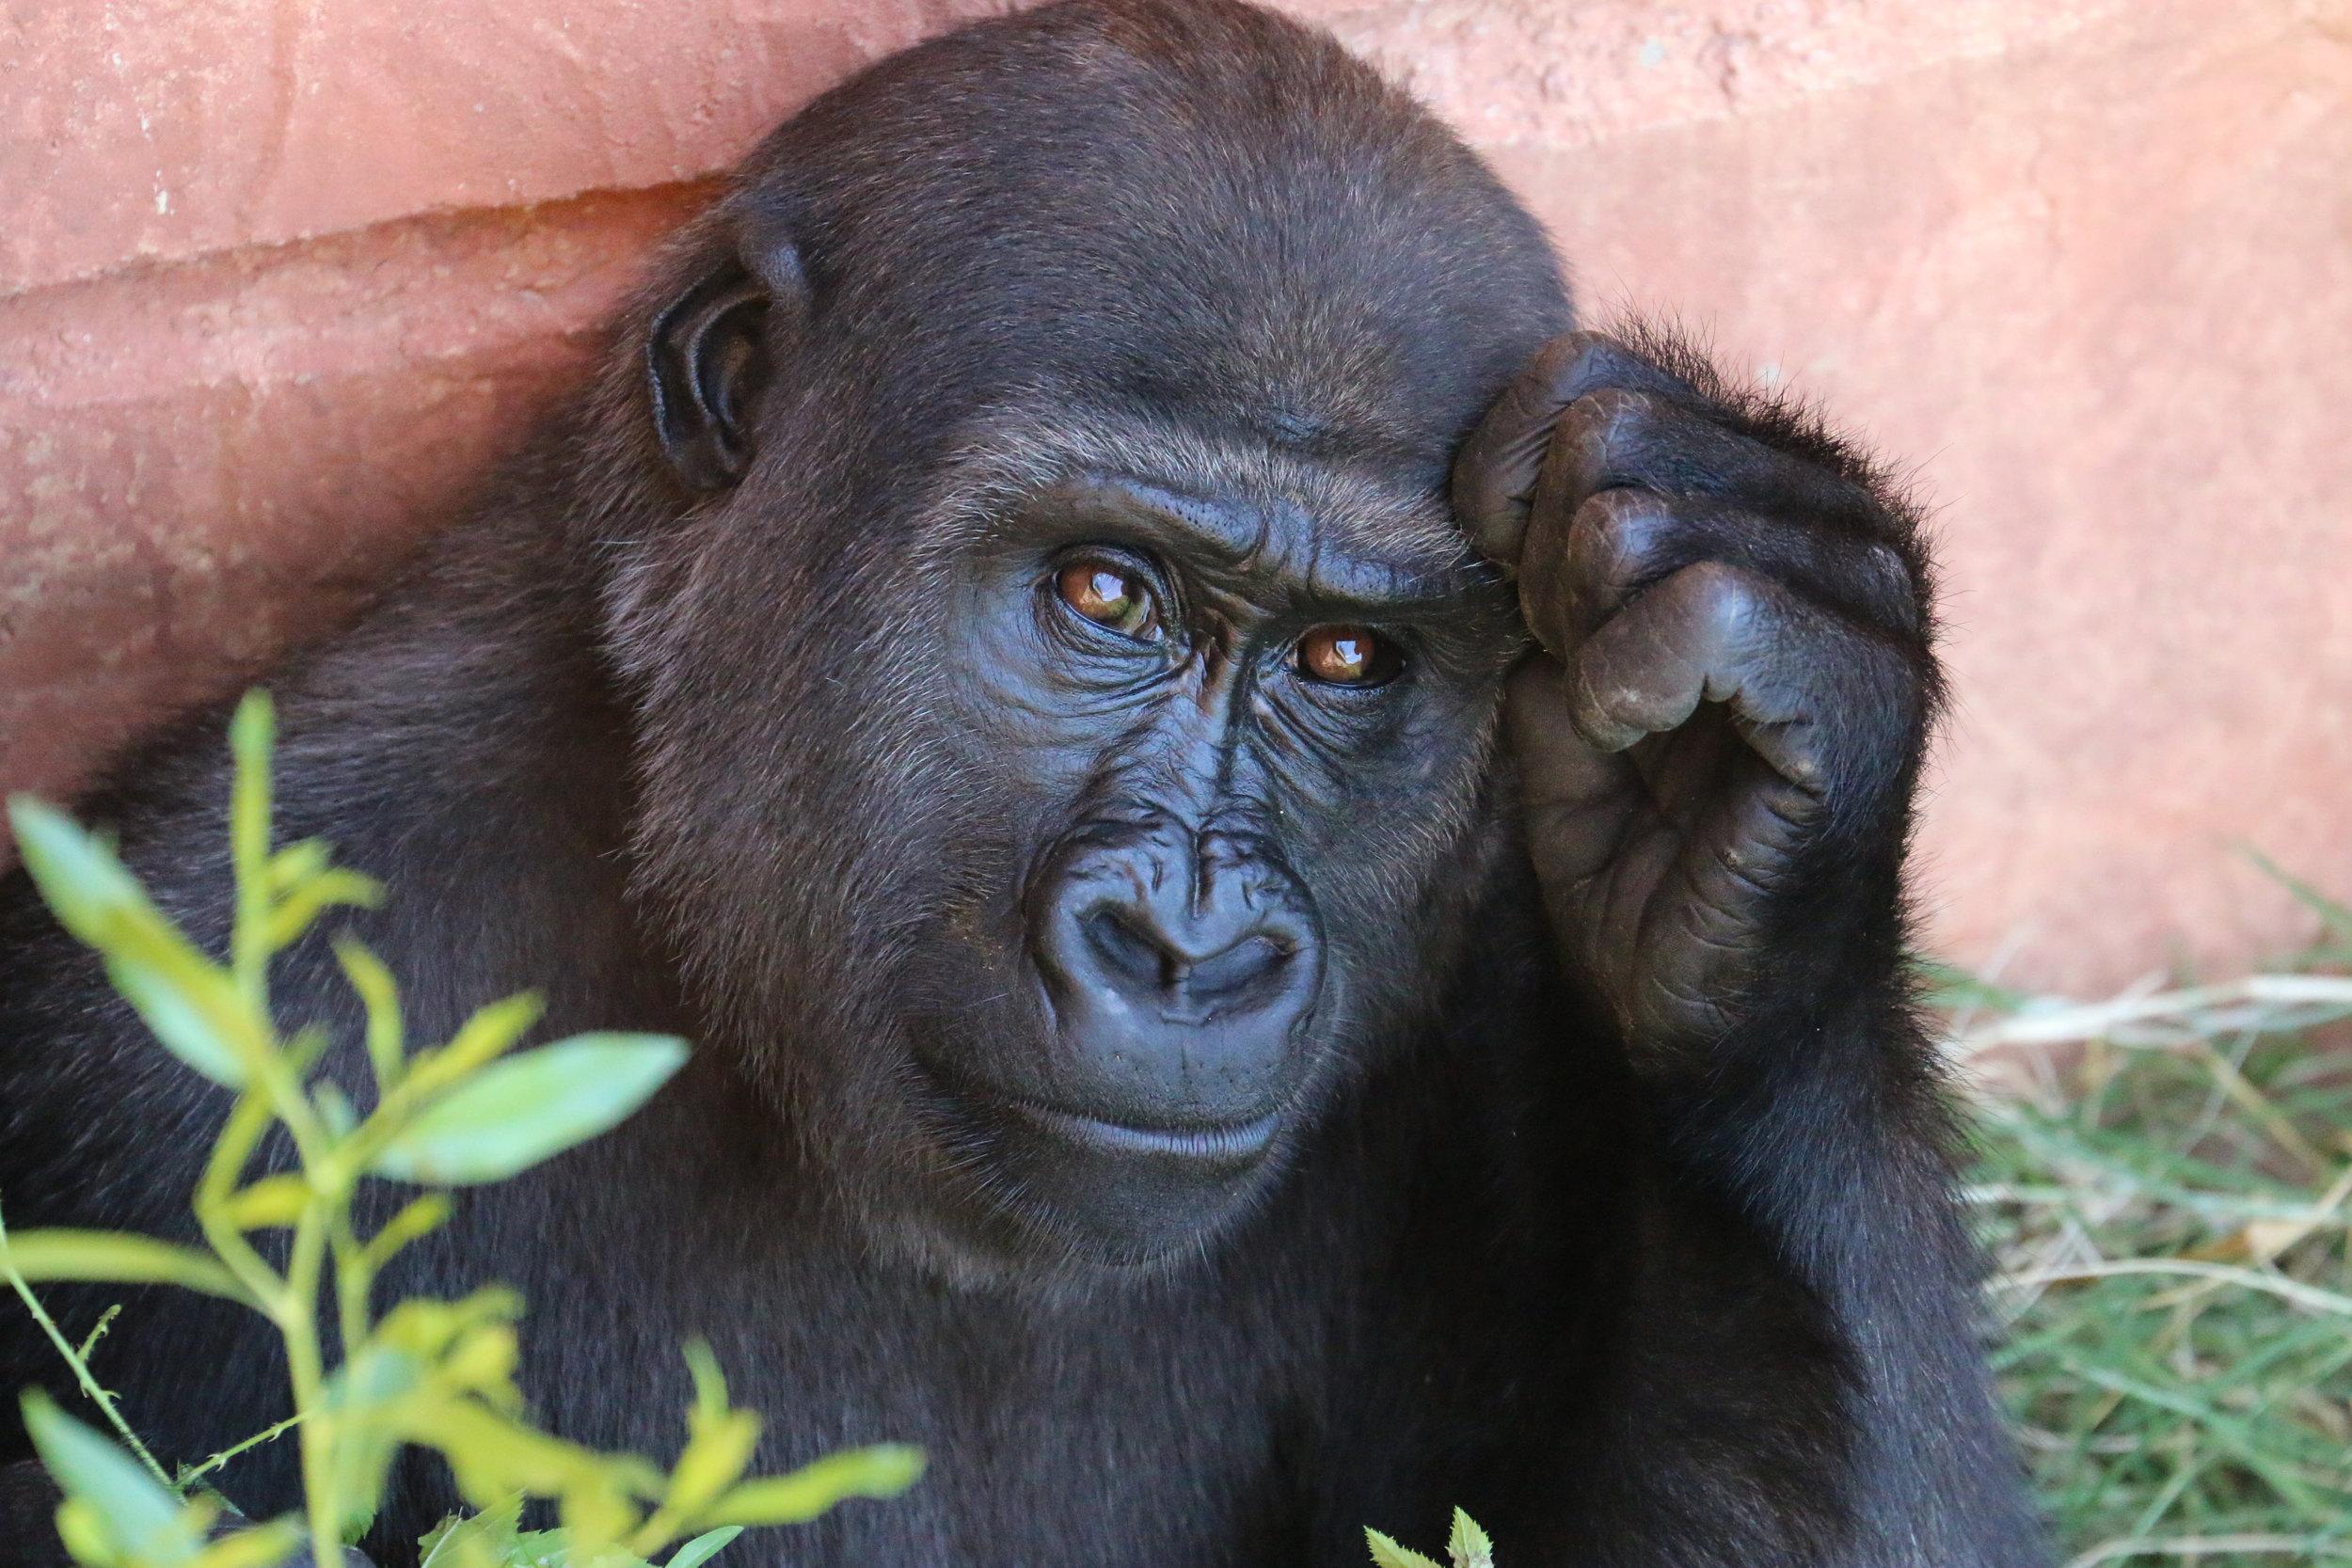 rob schrechise Gorilla Up cW.jpeg